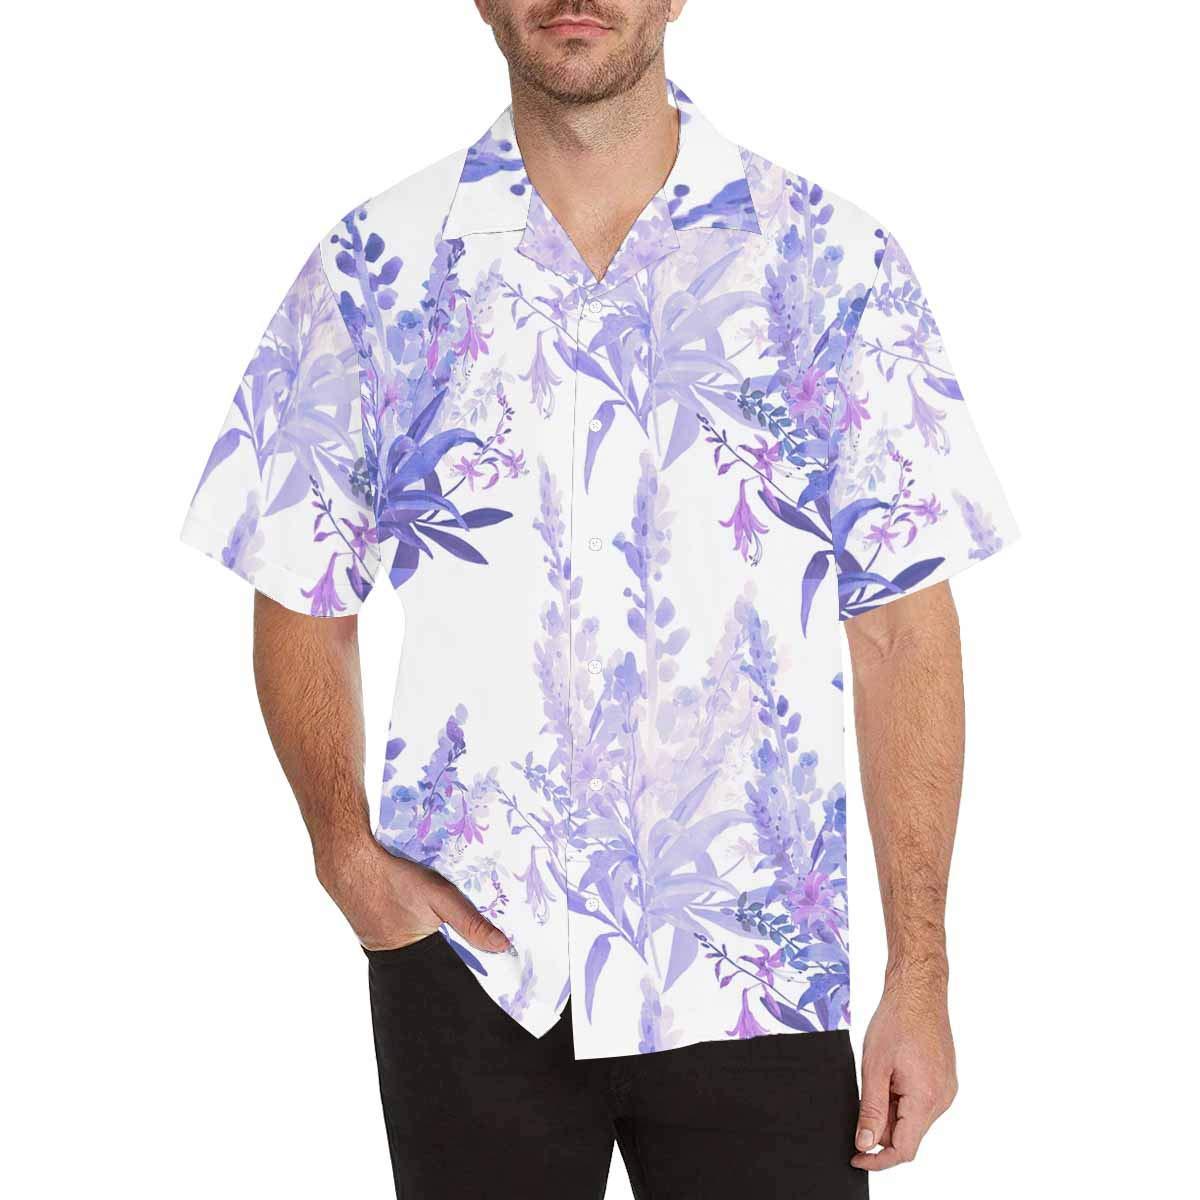 InterestPrint Mens Wildflowers Floral Tees Tops T-Shirts